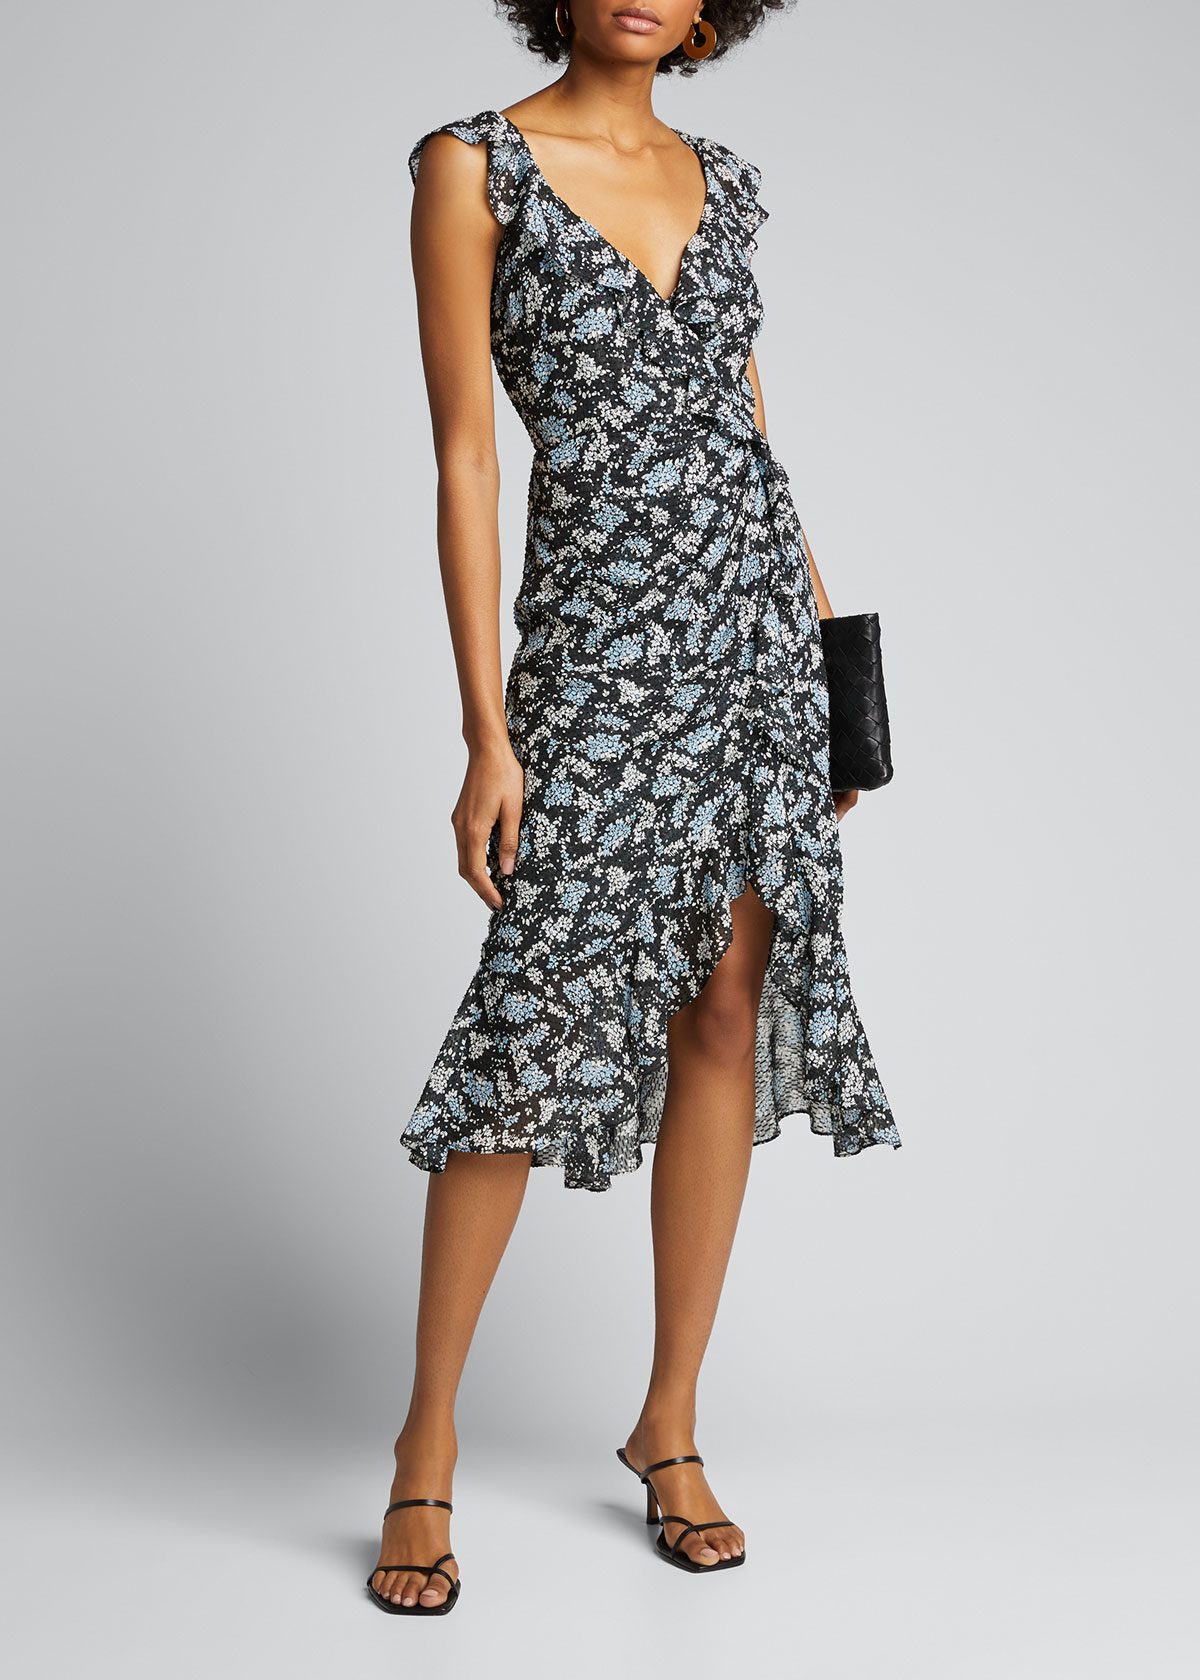 Veronica Beard Dresses AMAL FLORAL-PRINT DRESS